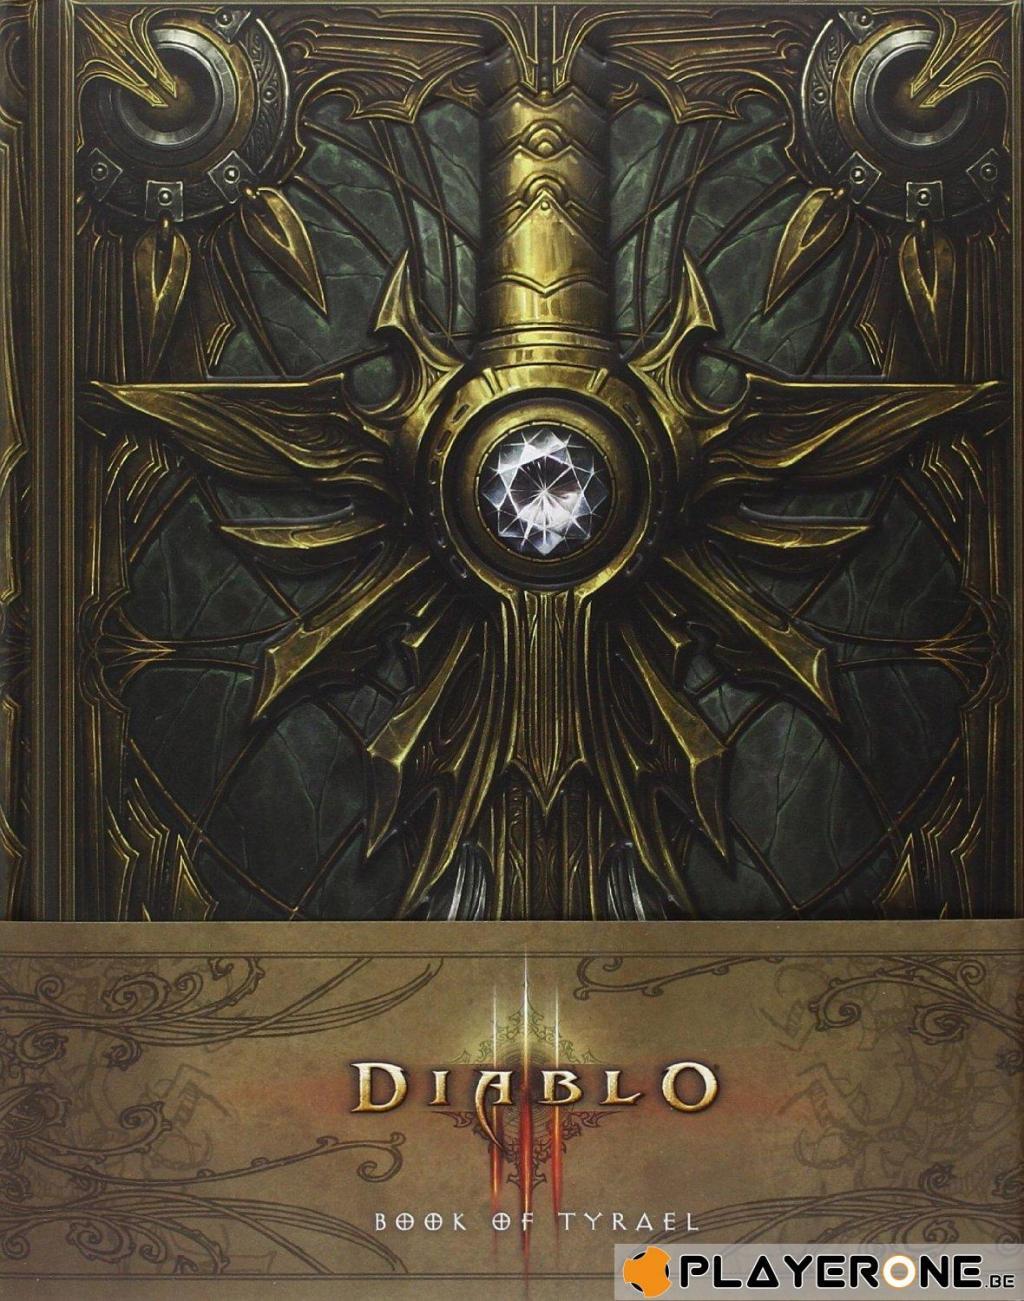 DIABLO III Le Livre de Tyrael (Pix n Love Edition)